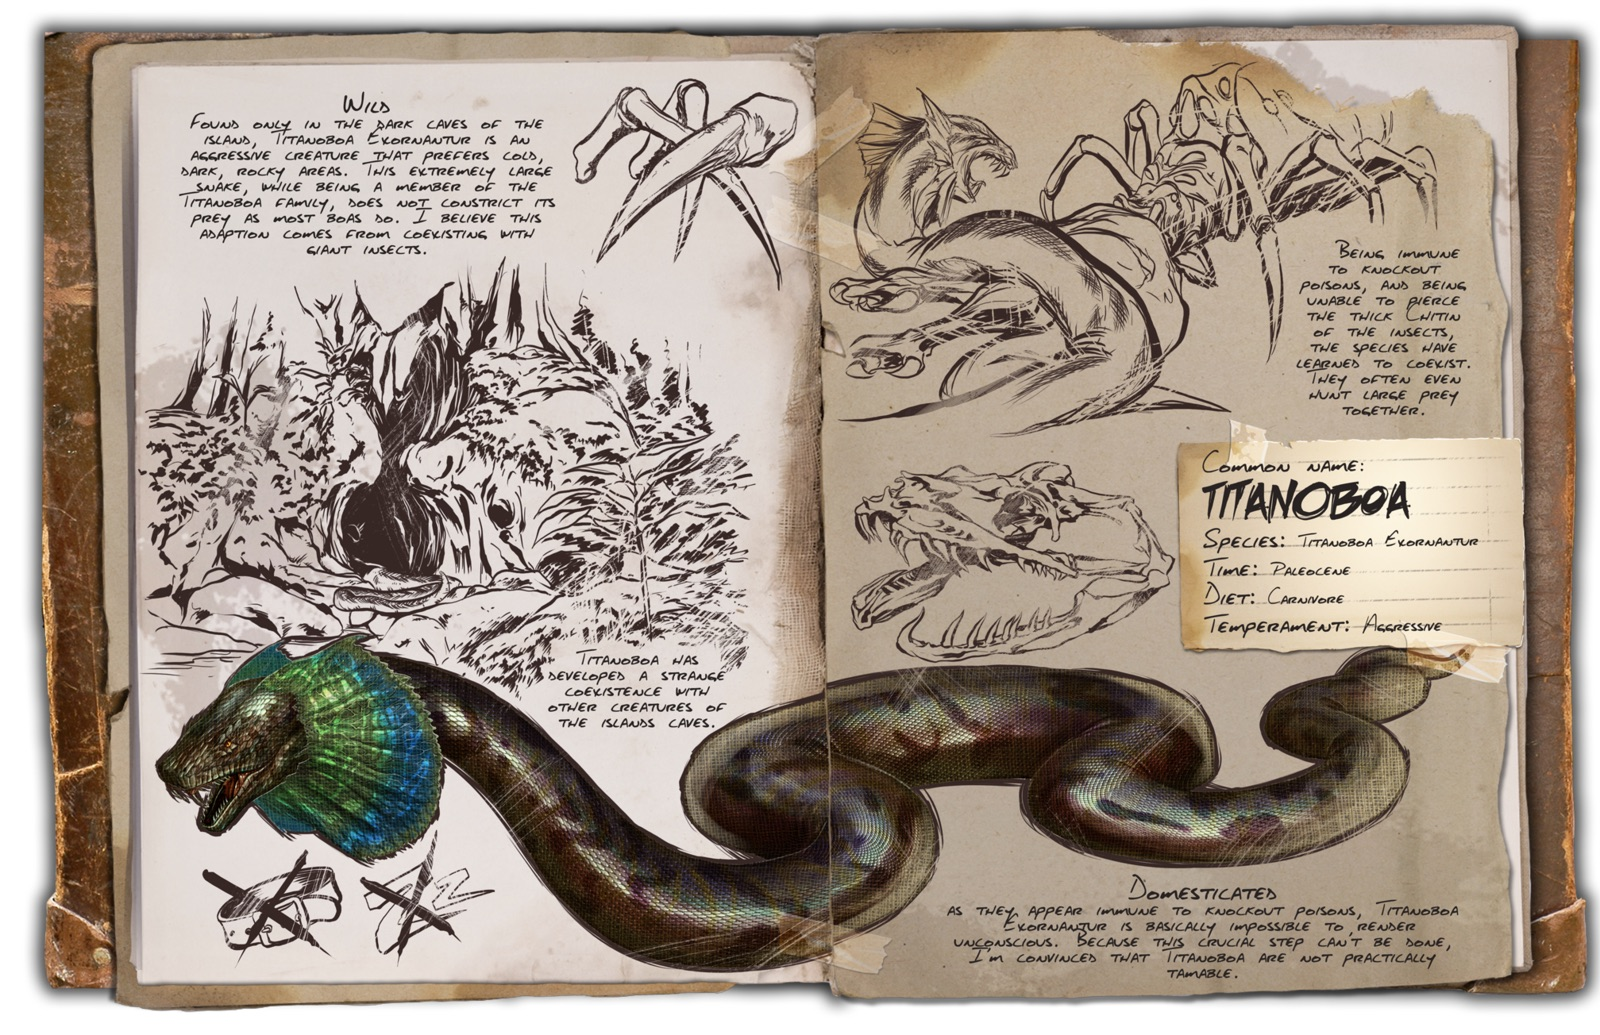 Deutsches Dino Dossier: Titanoboa